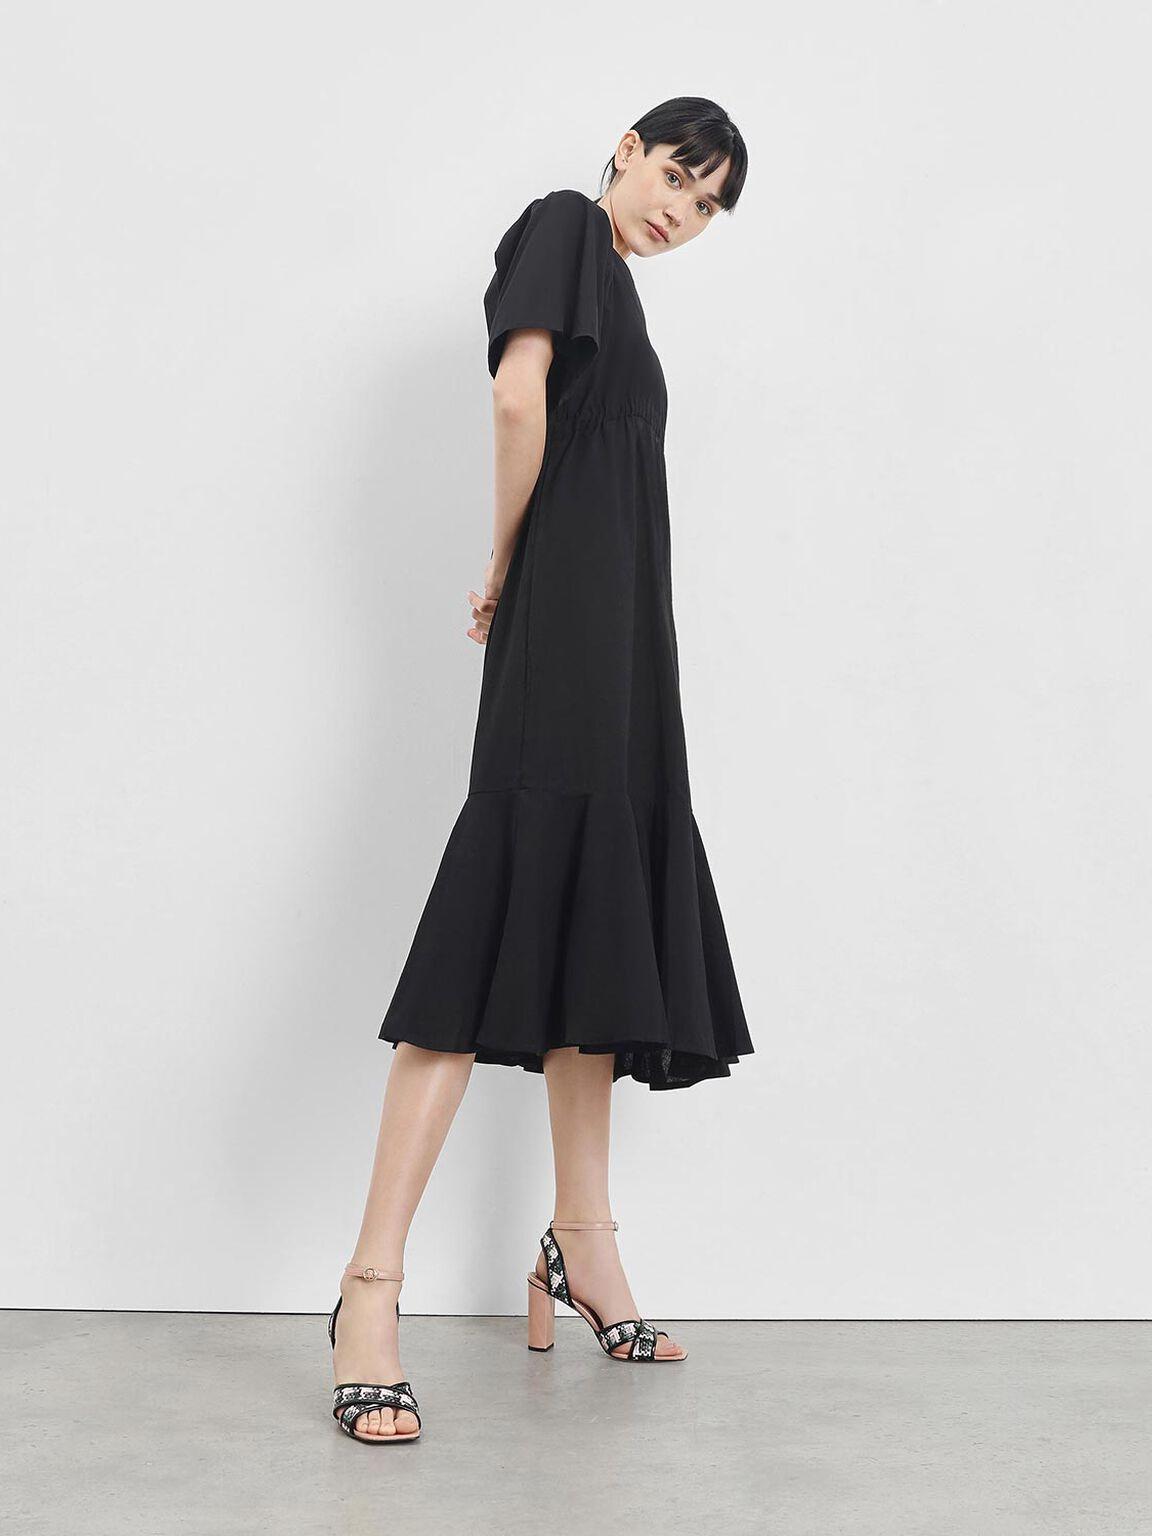 Woven Raffia Two-Tone Sandals, Blush, hi-res